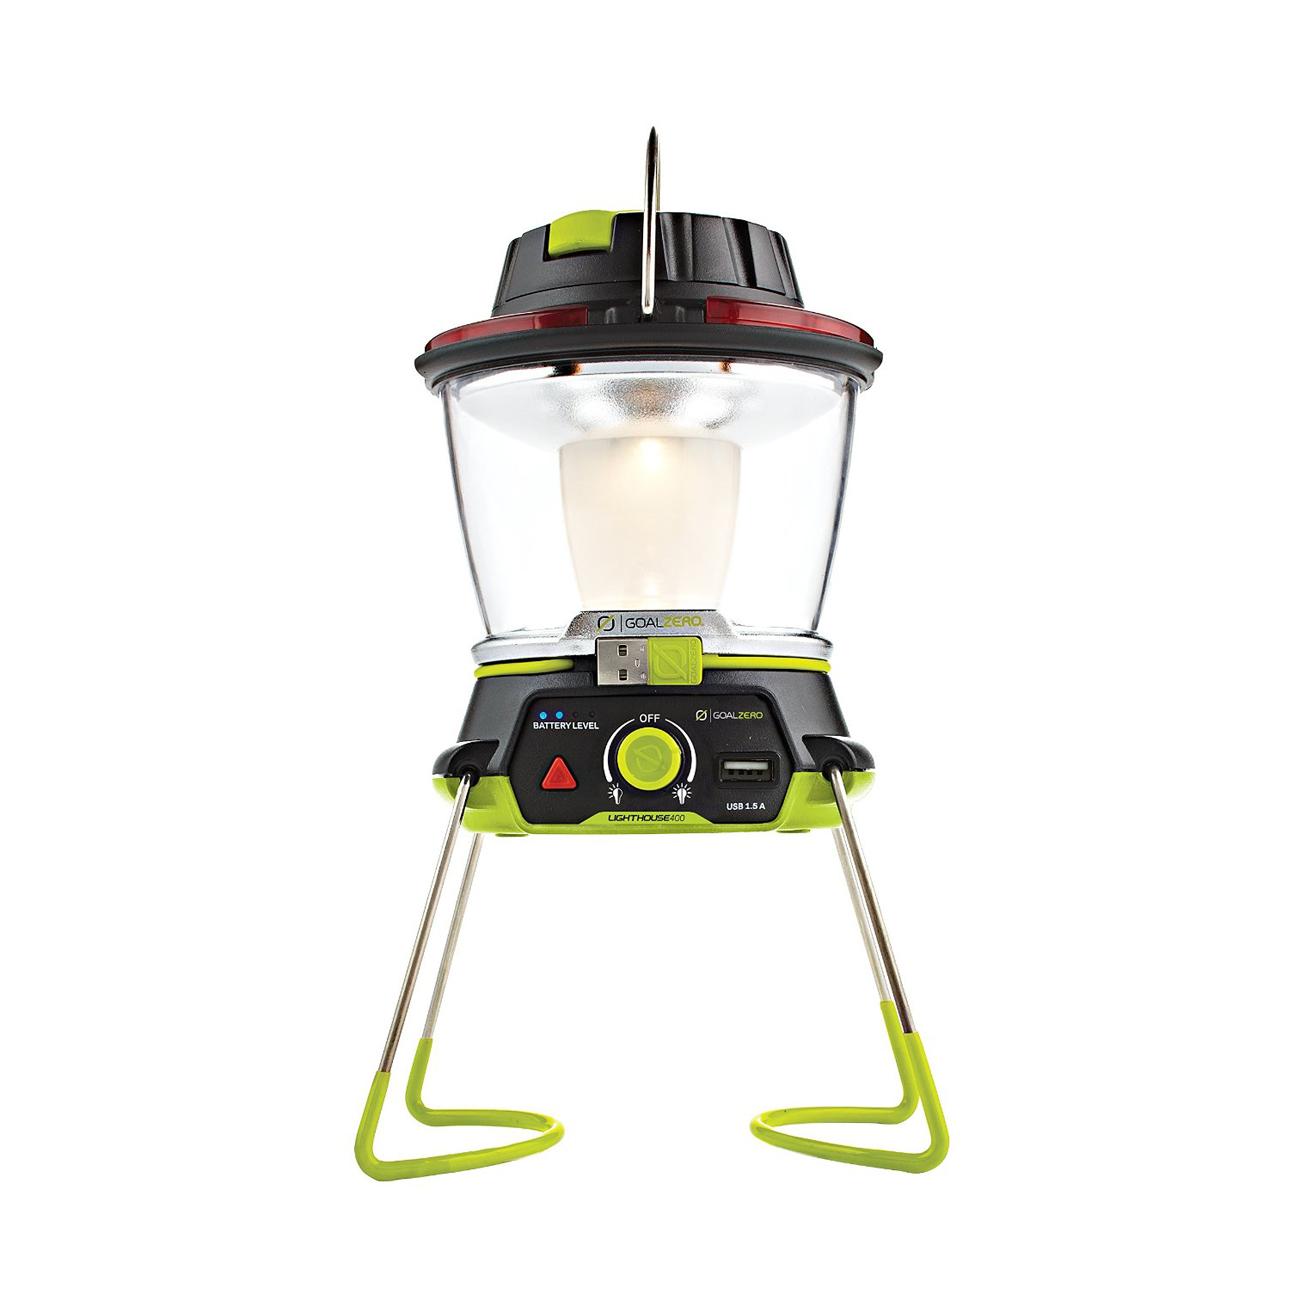 Goal Zero Lighthouse 400 Lantern and USB Power Hub - bit.ly/2fVAEmP